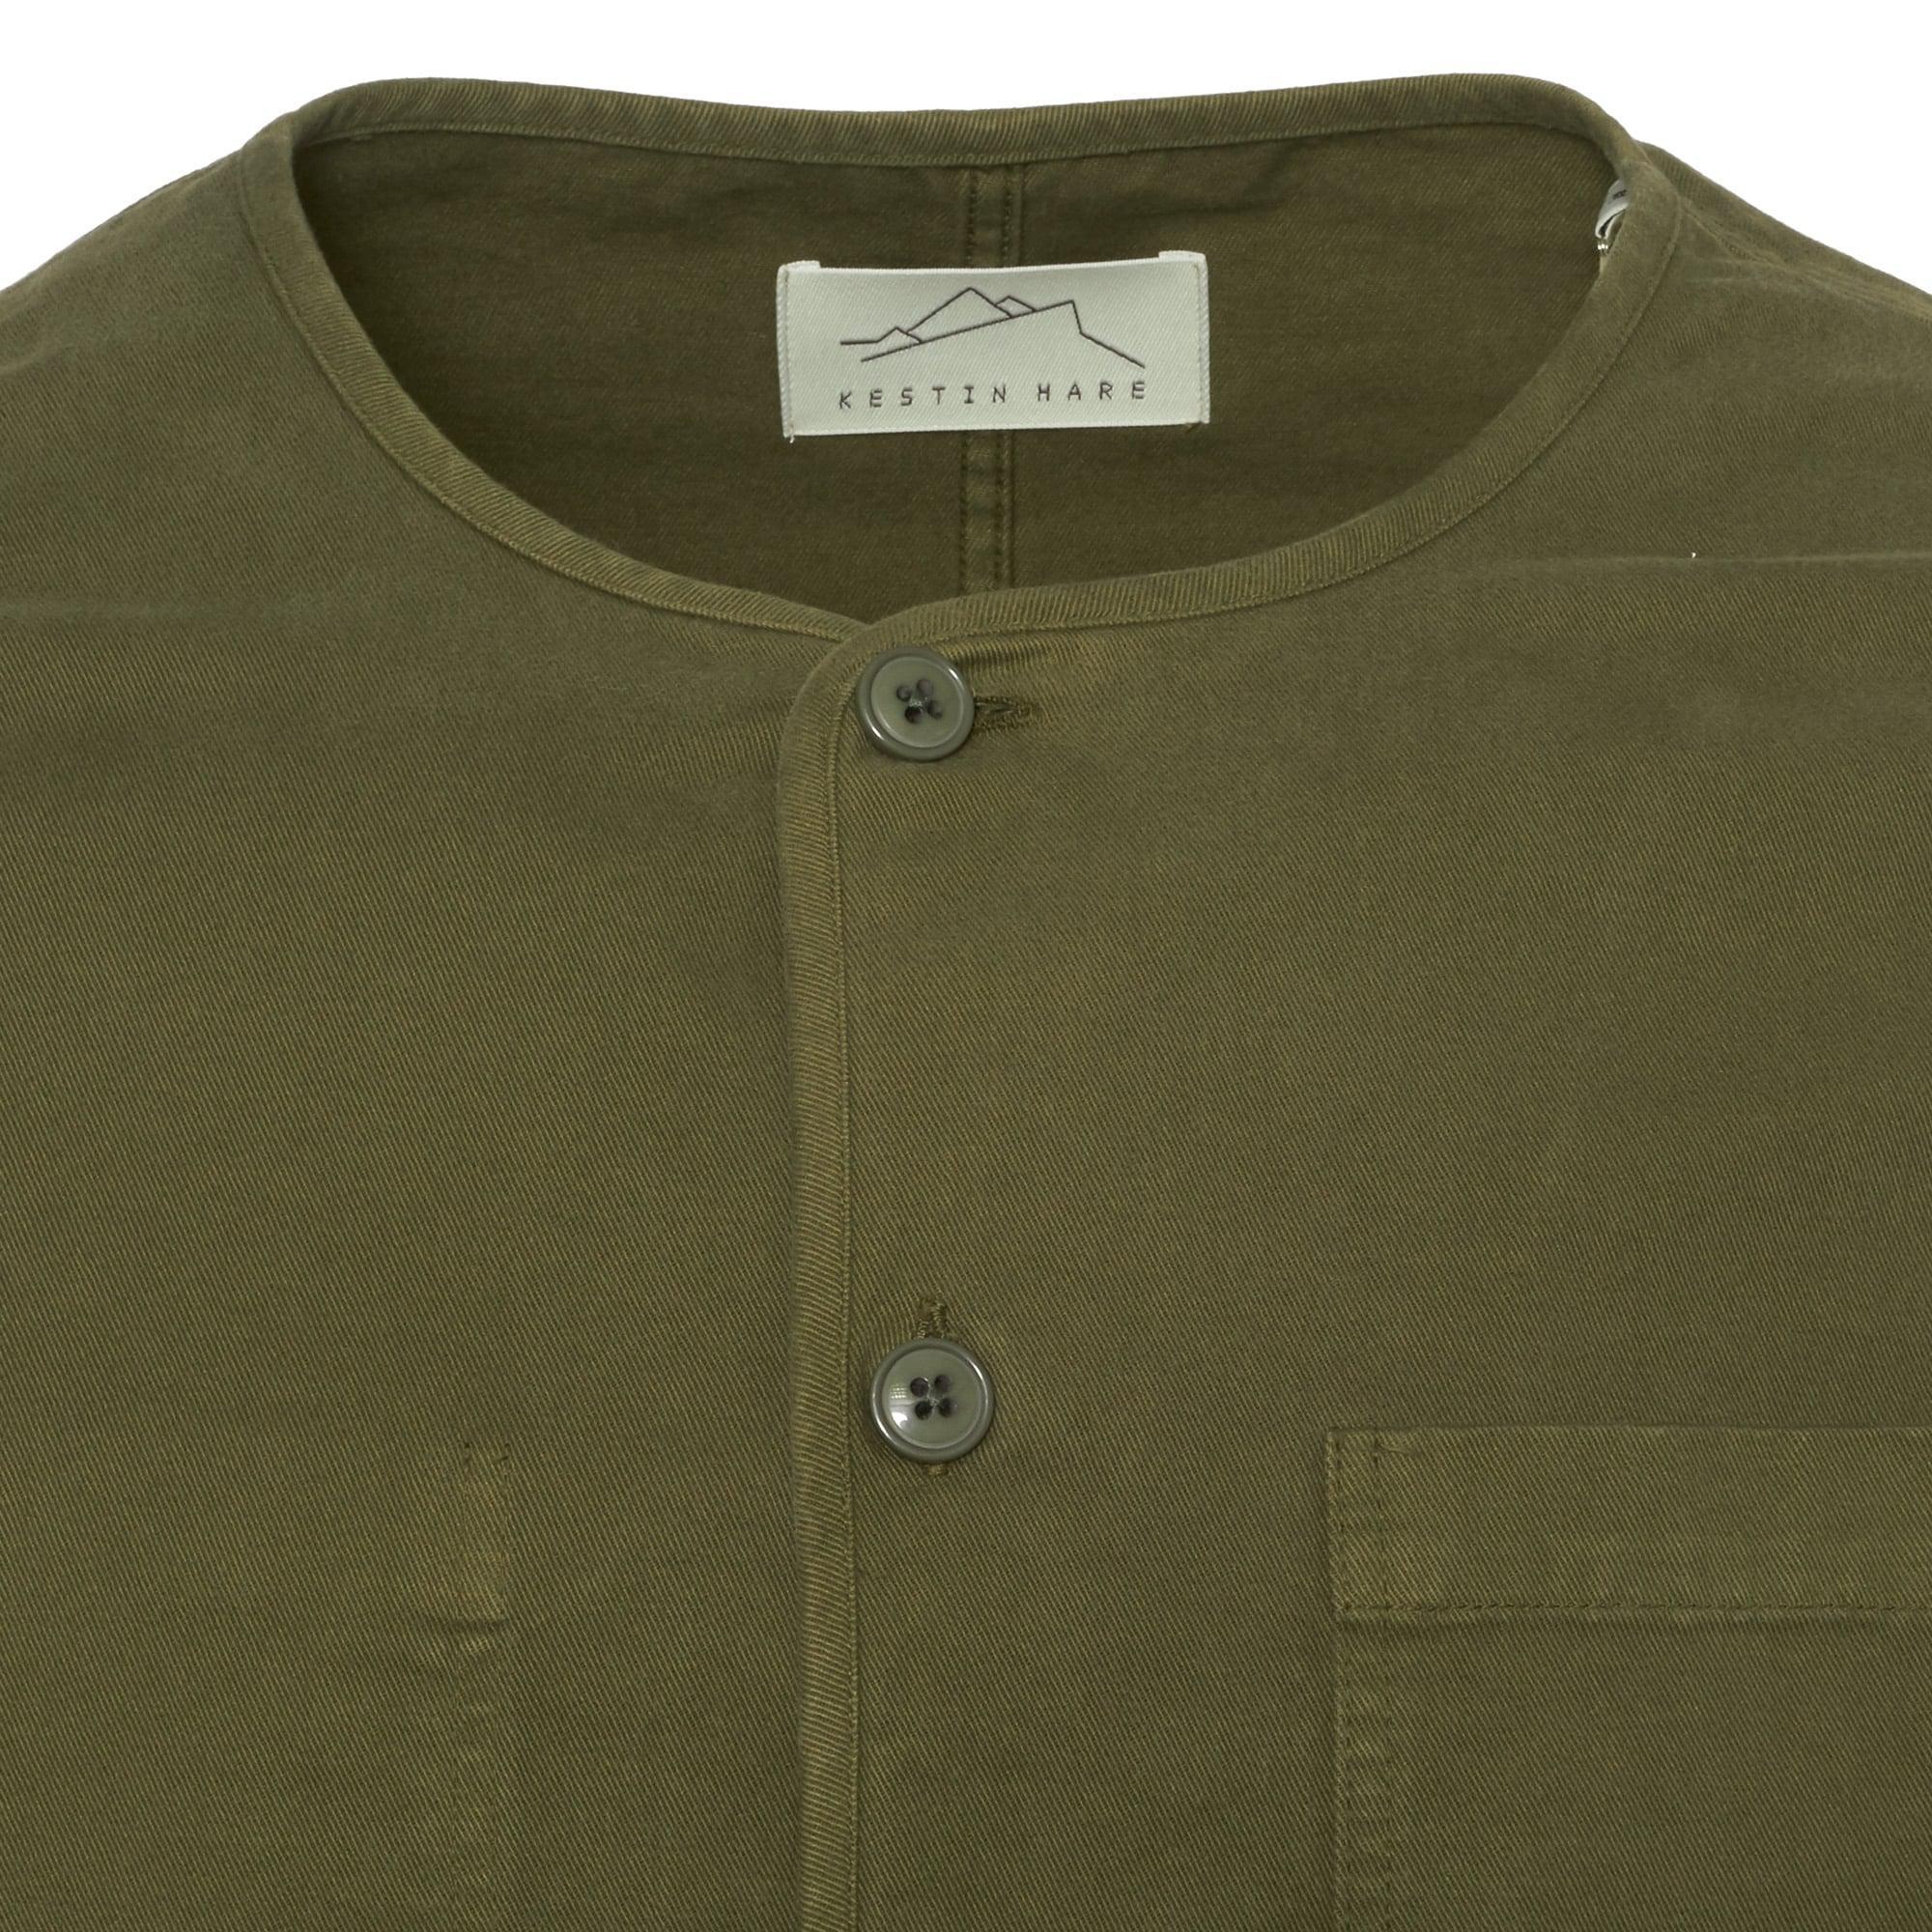 1815f59473d Lyst - Kestin Hare Olive Lanark Jacket in Green for Men